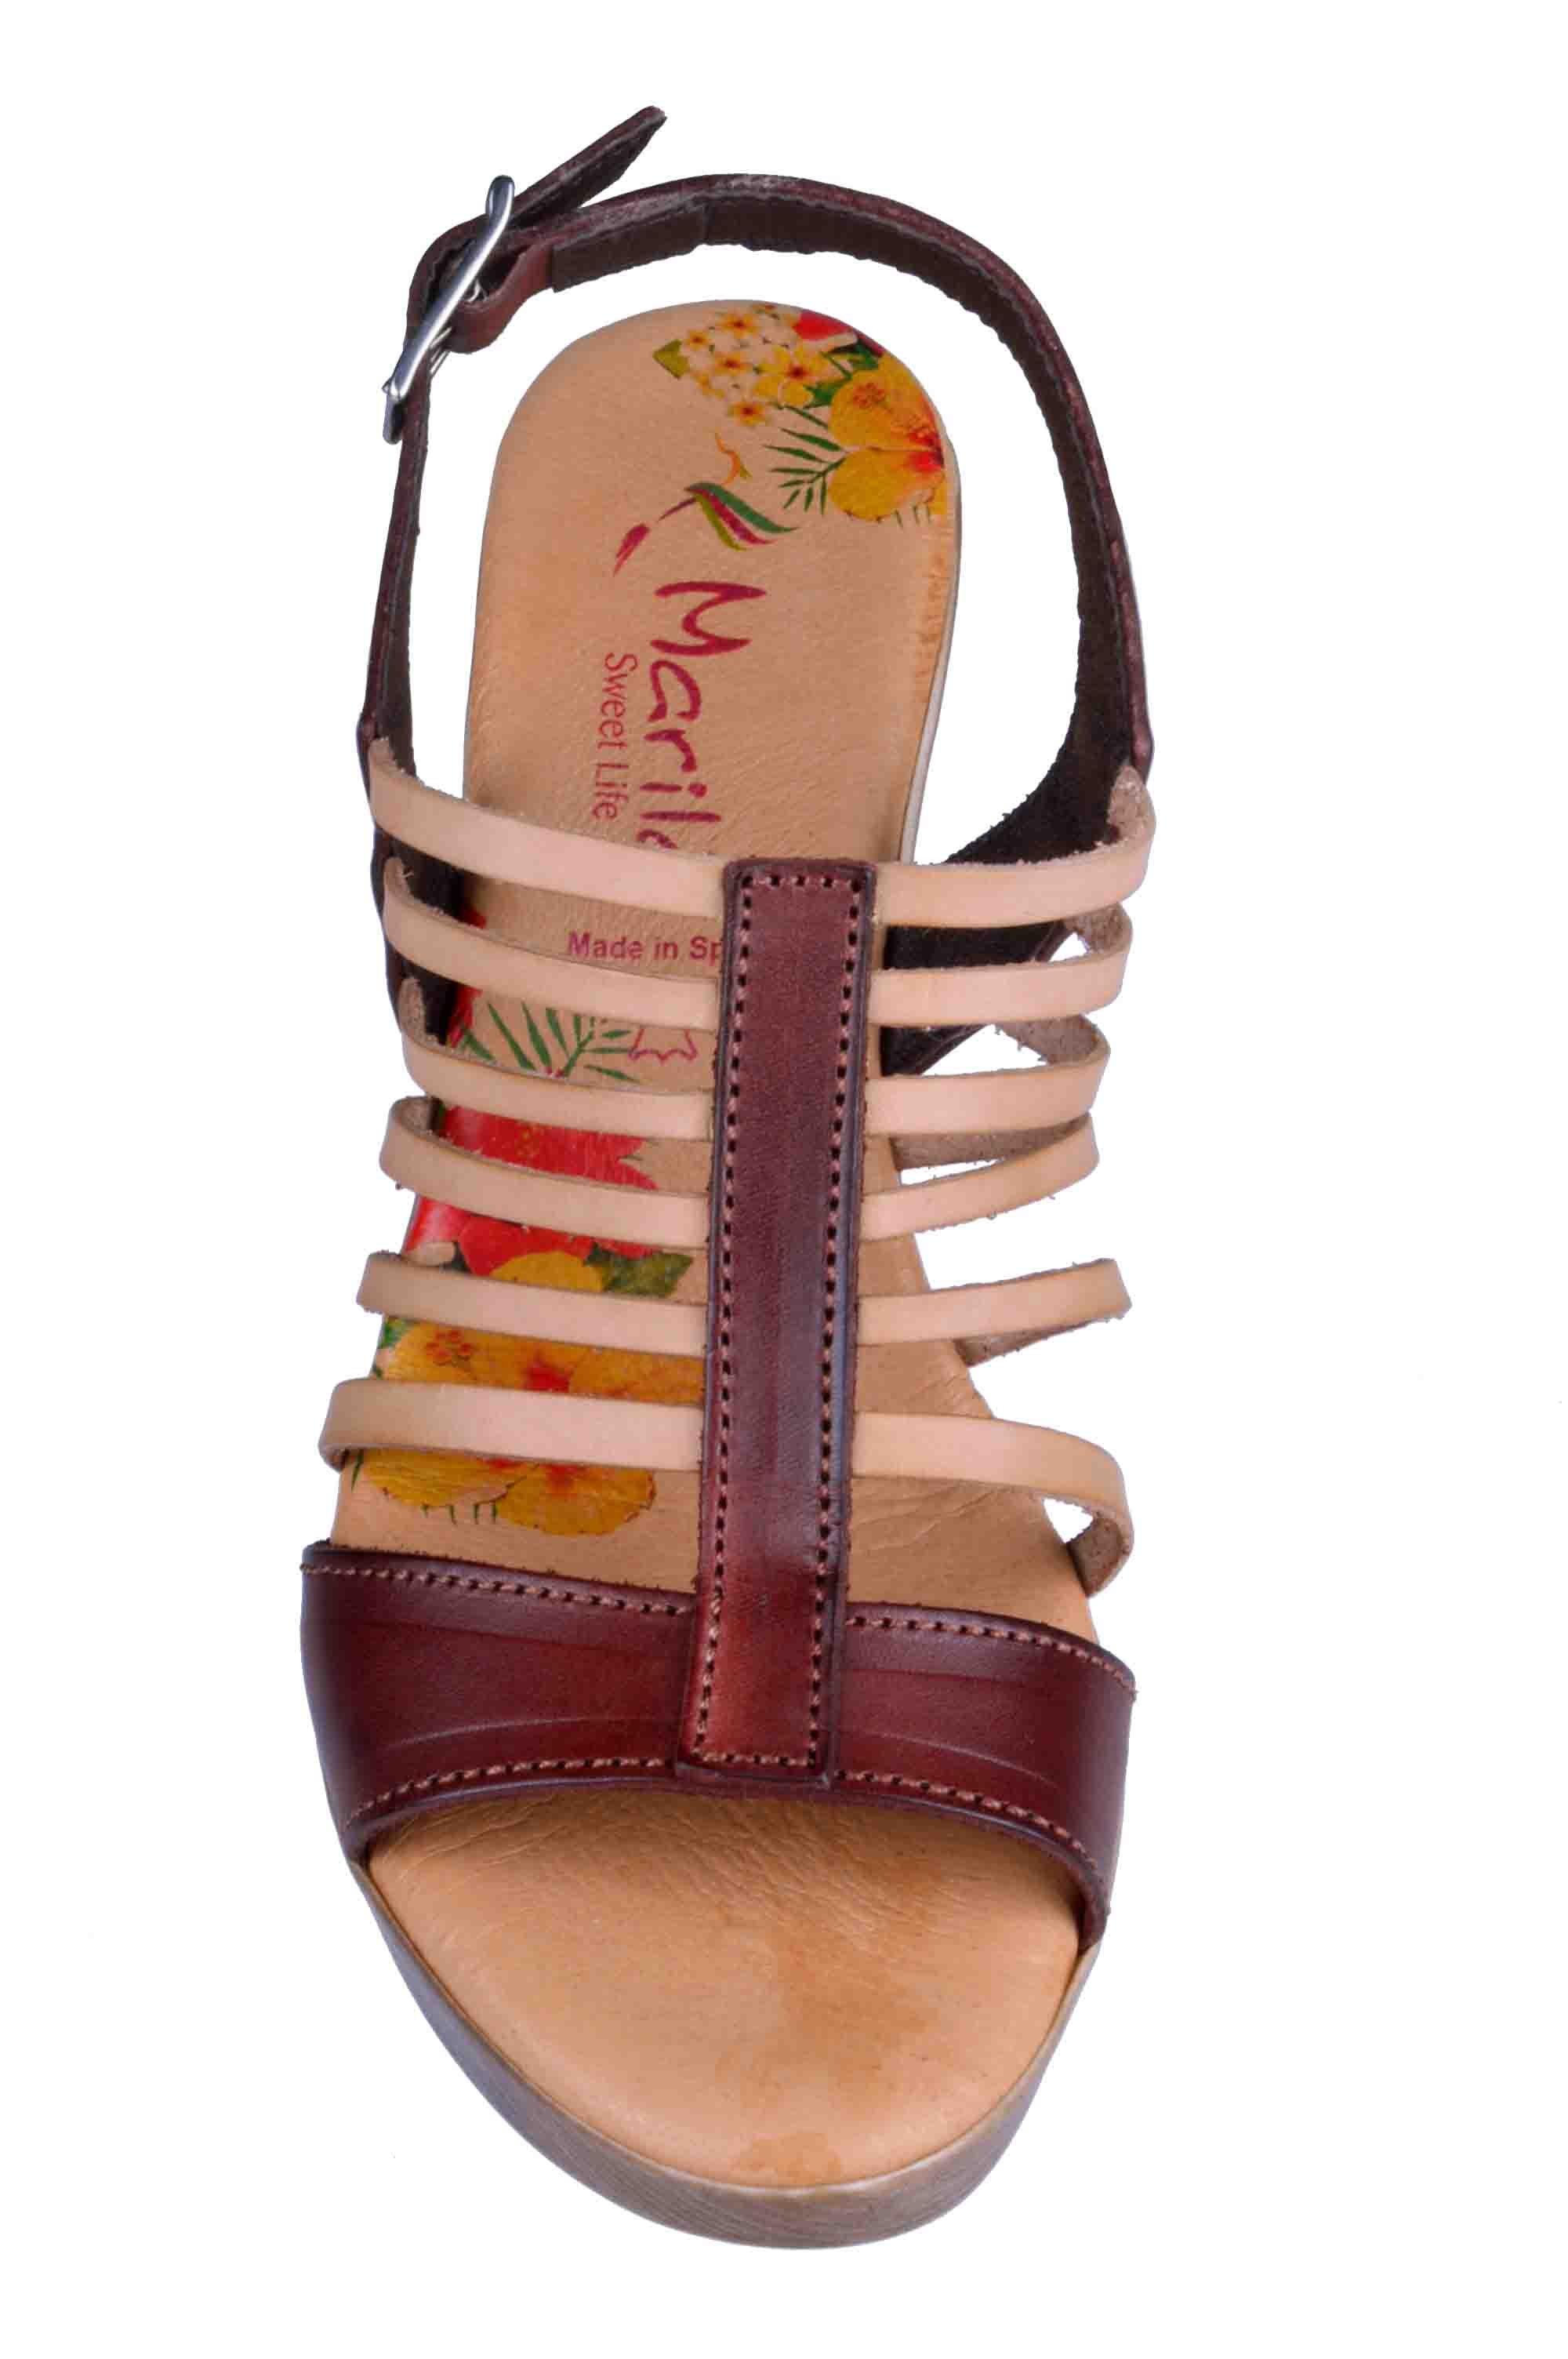 bc069a088d6 Γυναικεια Πεδιλα Marila Shoes 748-6020-29 Καφε | Apostolidis Shoes